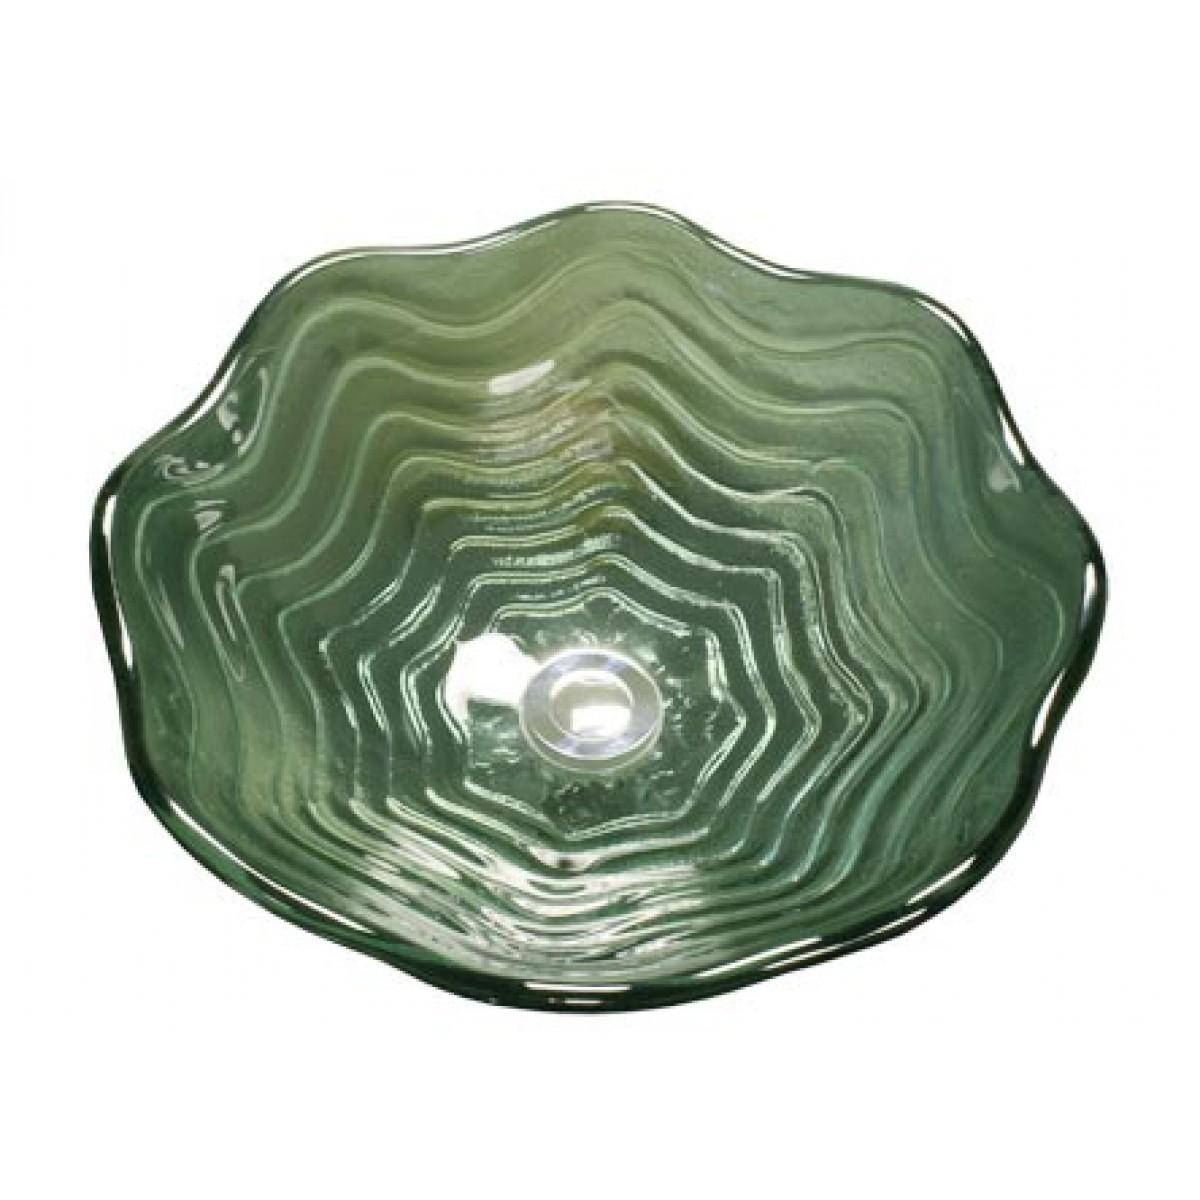 Green Pearl Shell Design Glass Countertop Bathroom Lavatory Vessel Sink    16 1/2 X 5 3/4 Inch